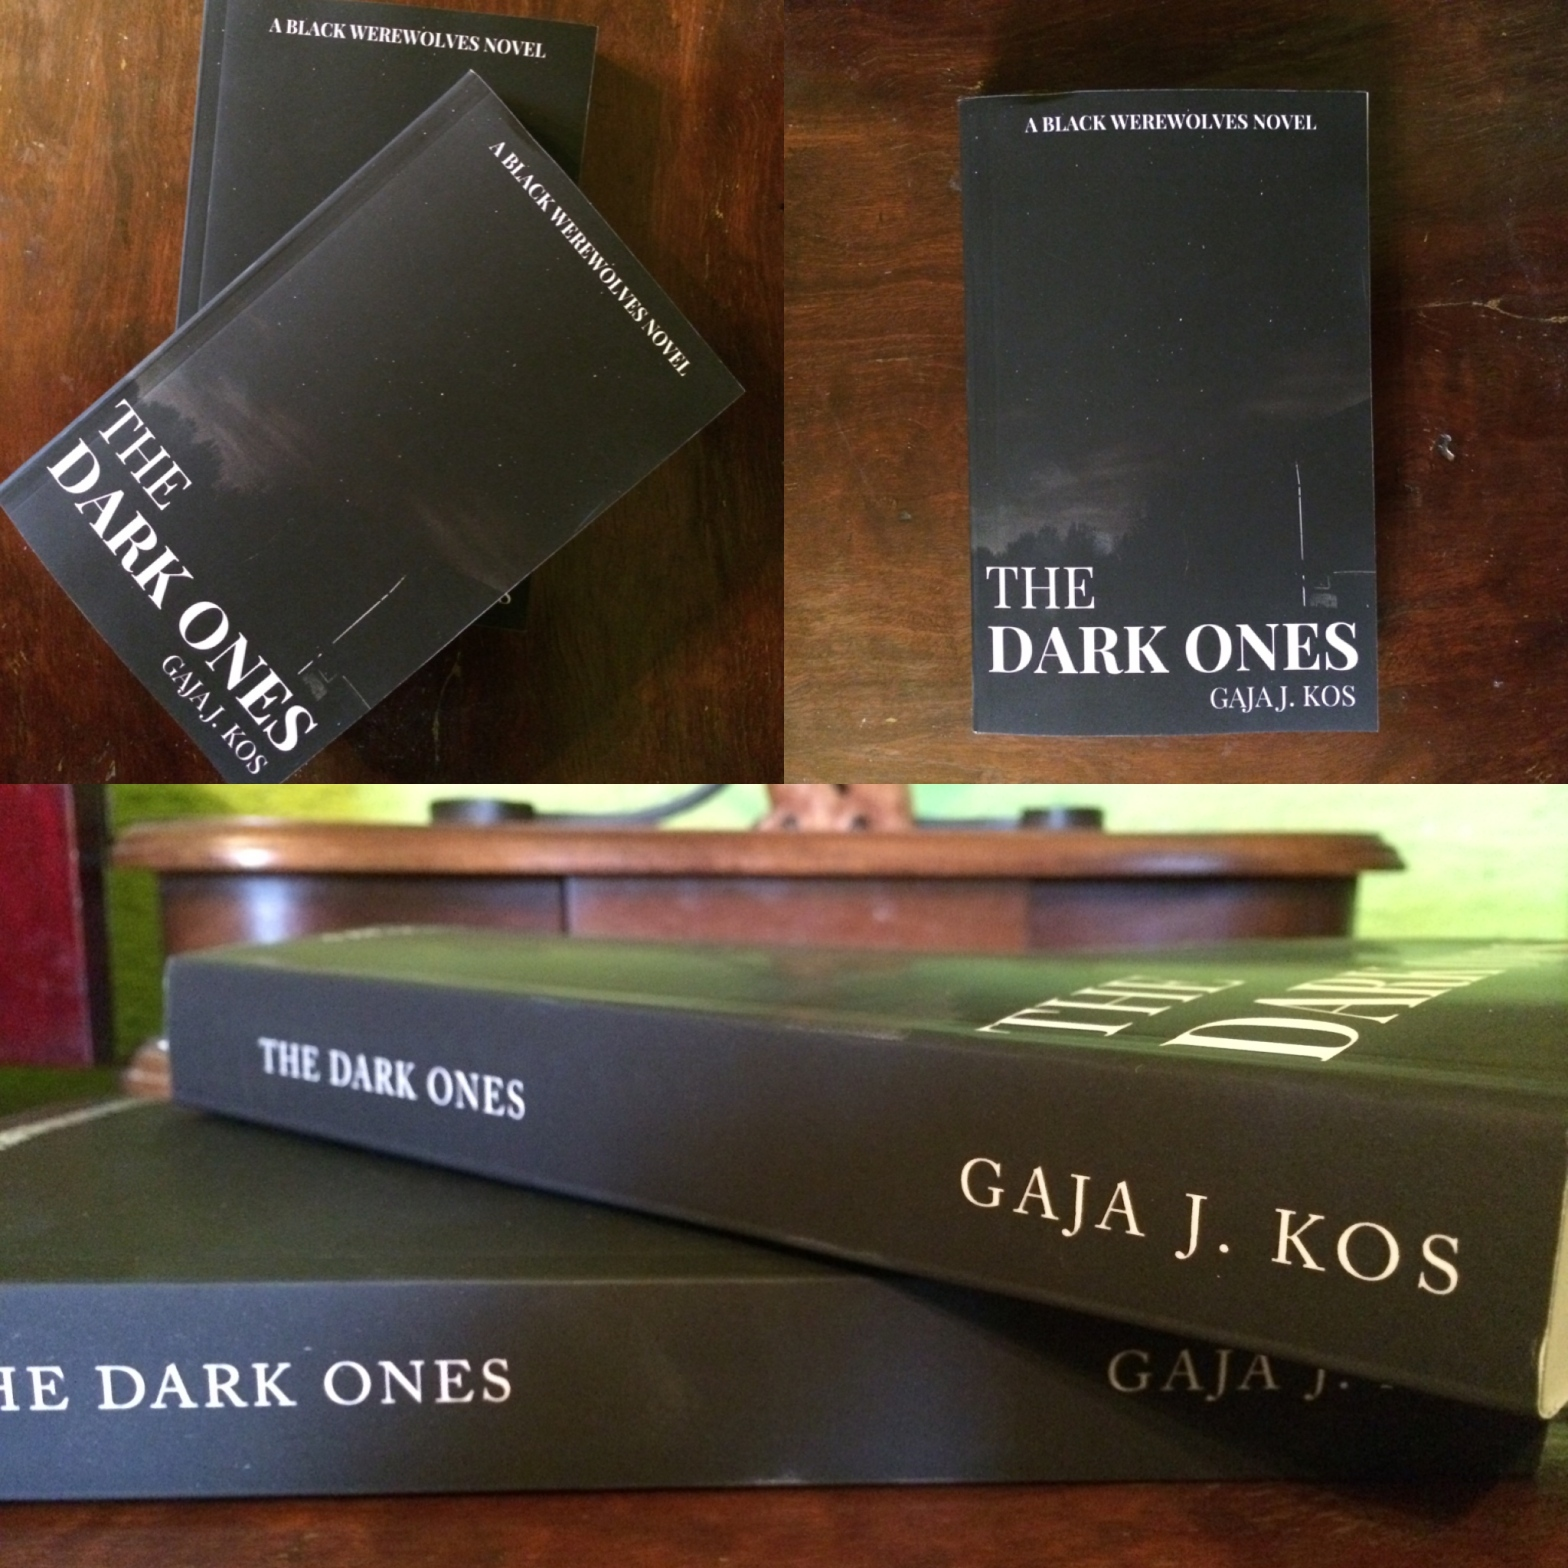 the dark ones gaja jezernik kos